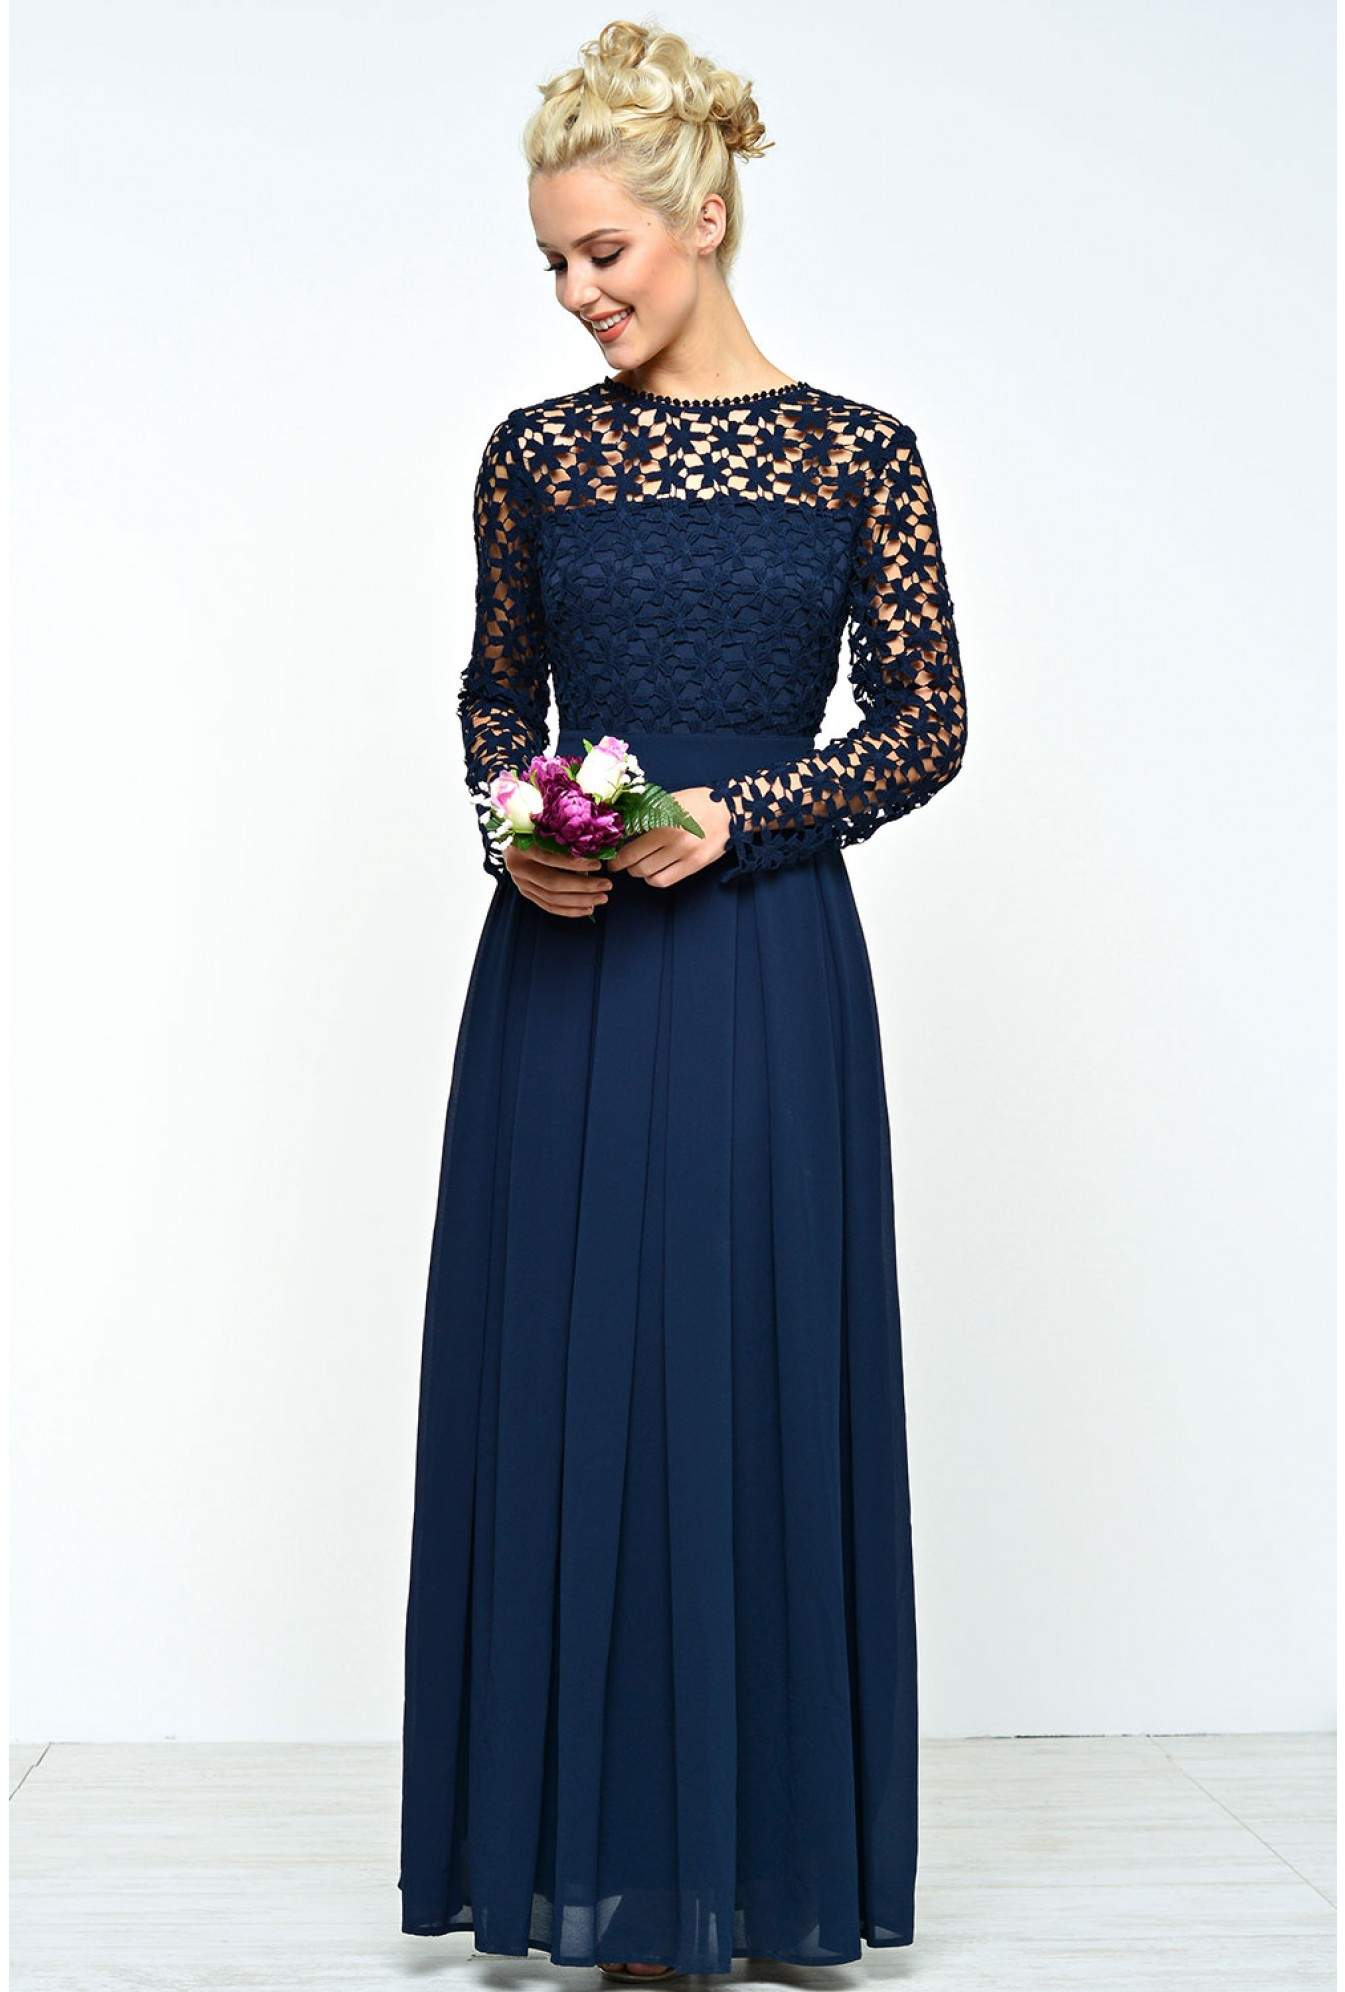 4544711fa466 iCLOTHING Flavia Crochet Top Maxi Dress in Navy | iCLOTHING